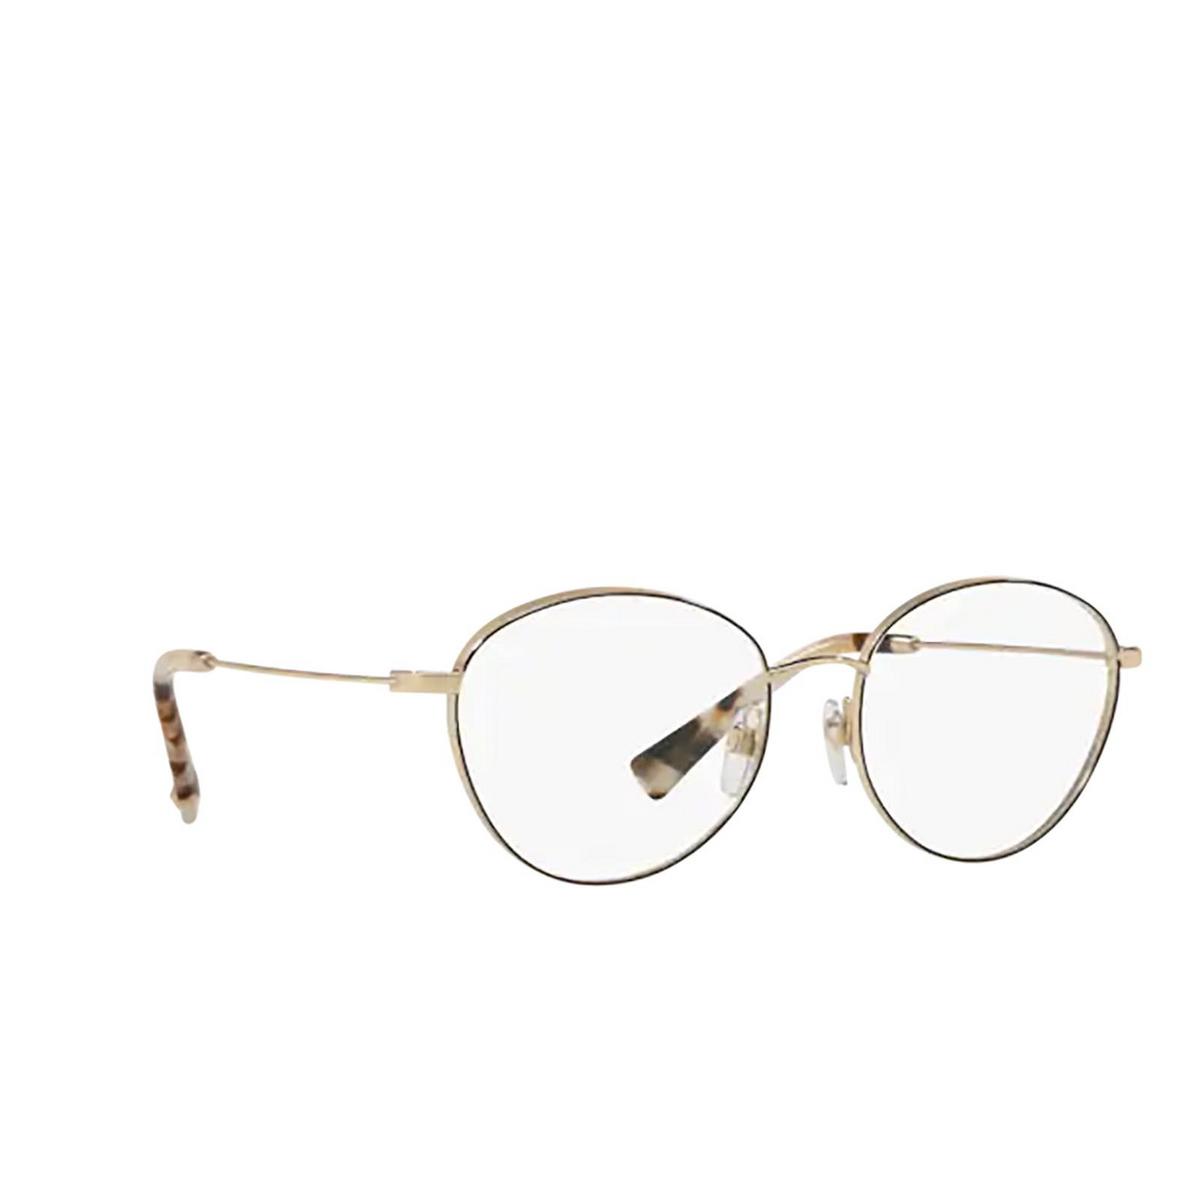 Valentino® Oval Eyeglasses: VA1003 color Pale Gold / Black 3003 - three-quarters view.